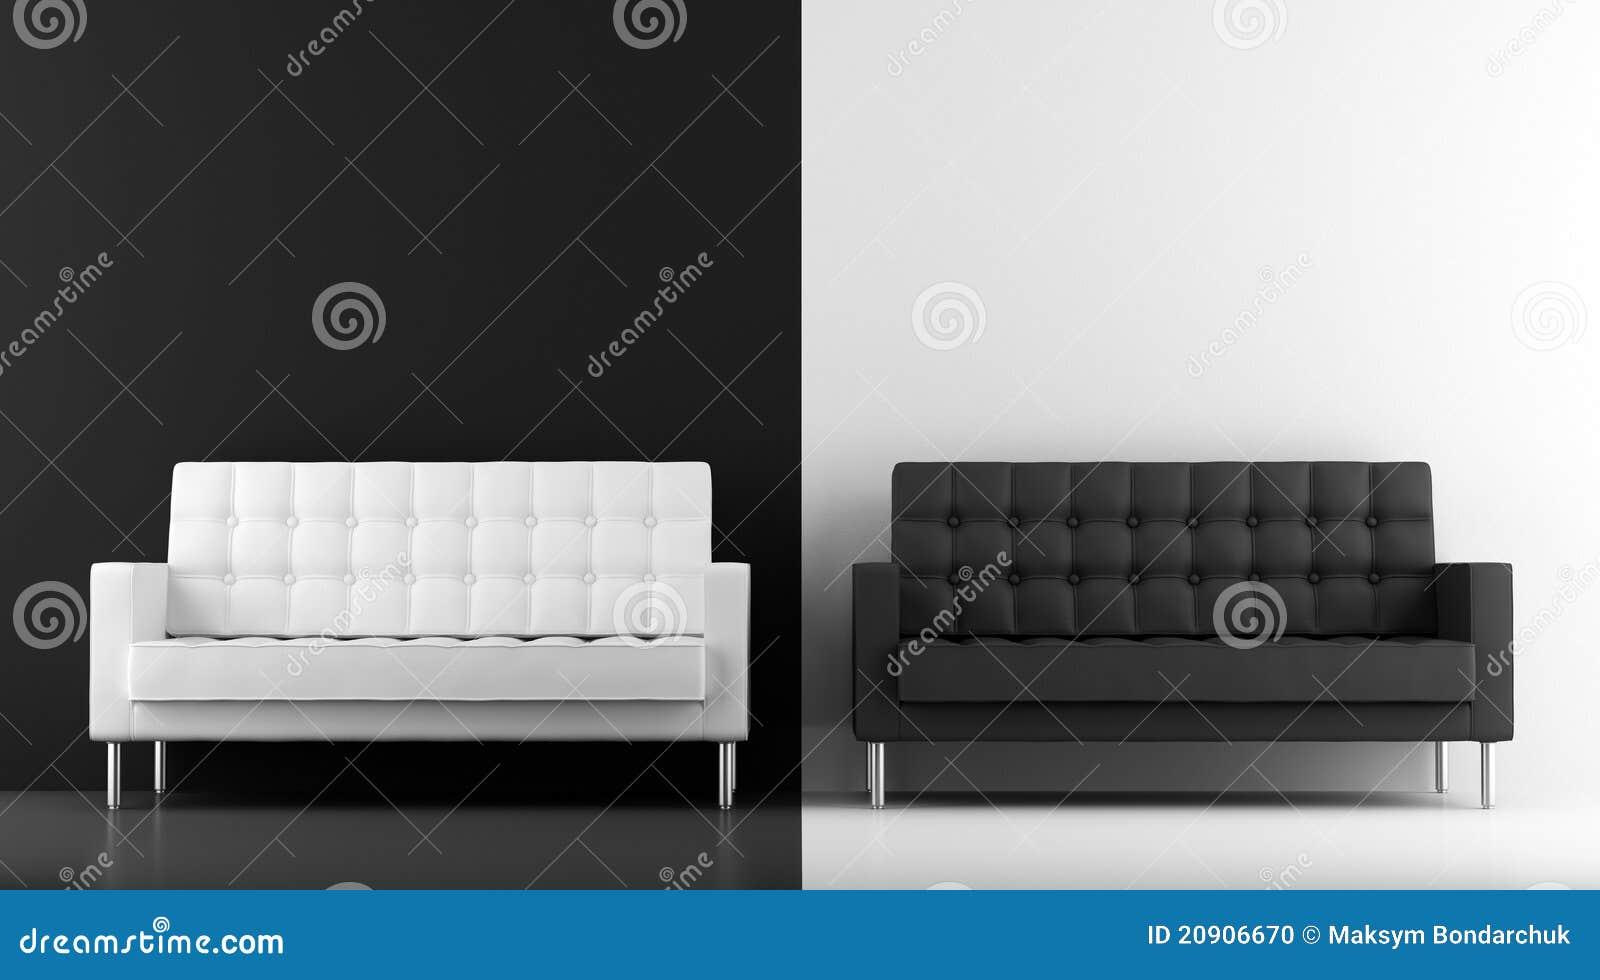 sofs blancos y negros - Sofas Negros